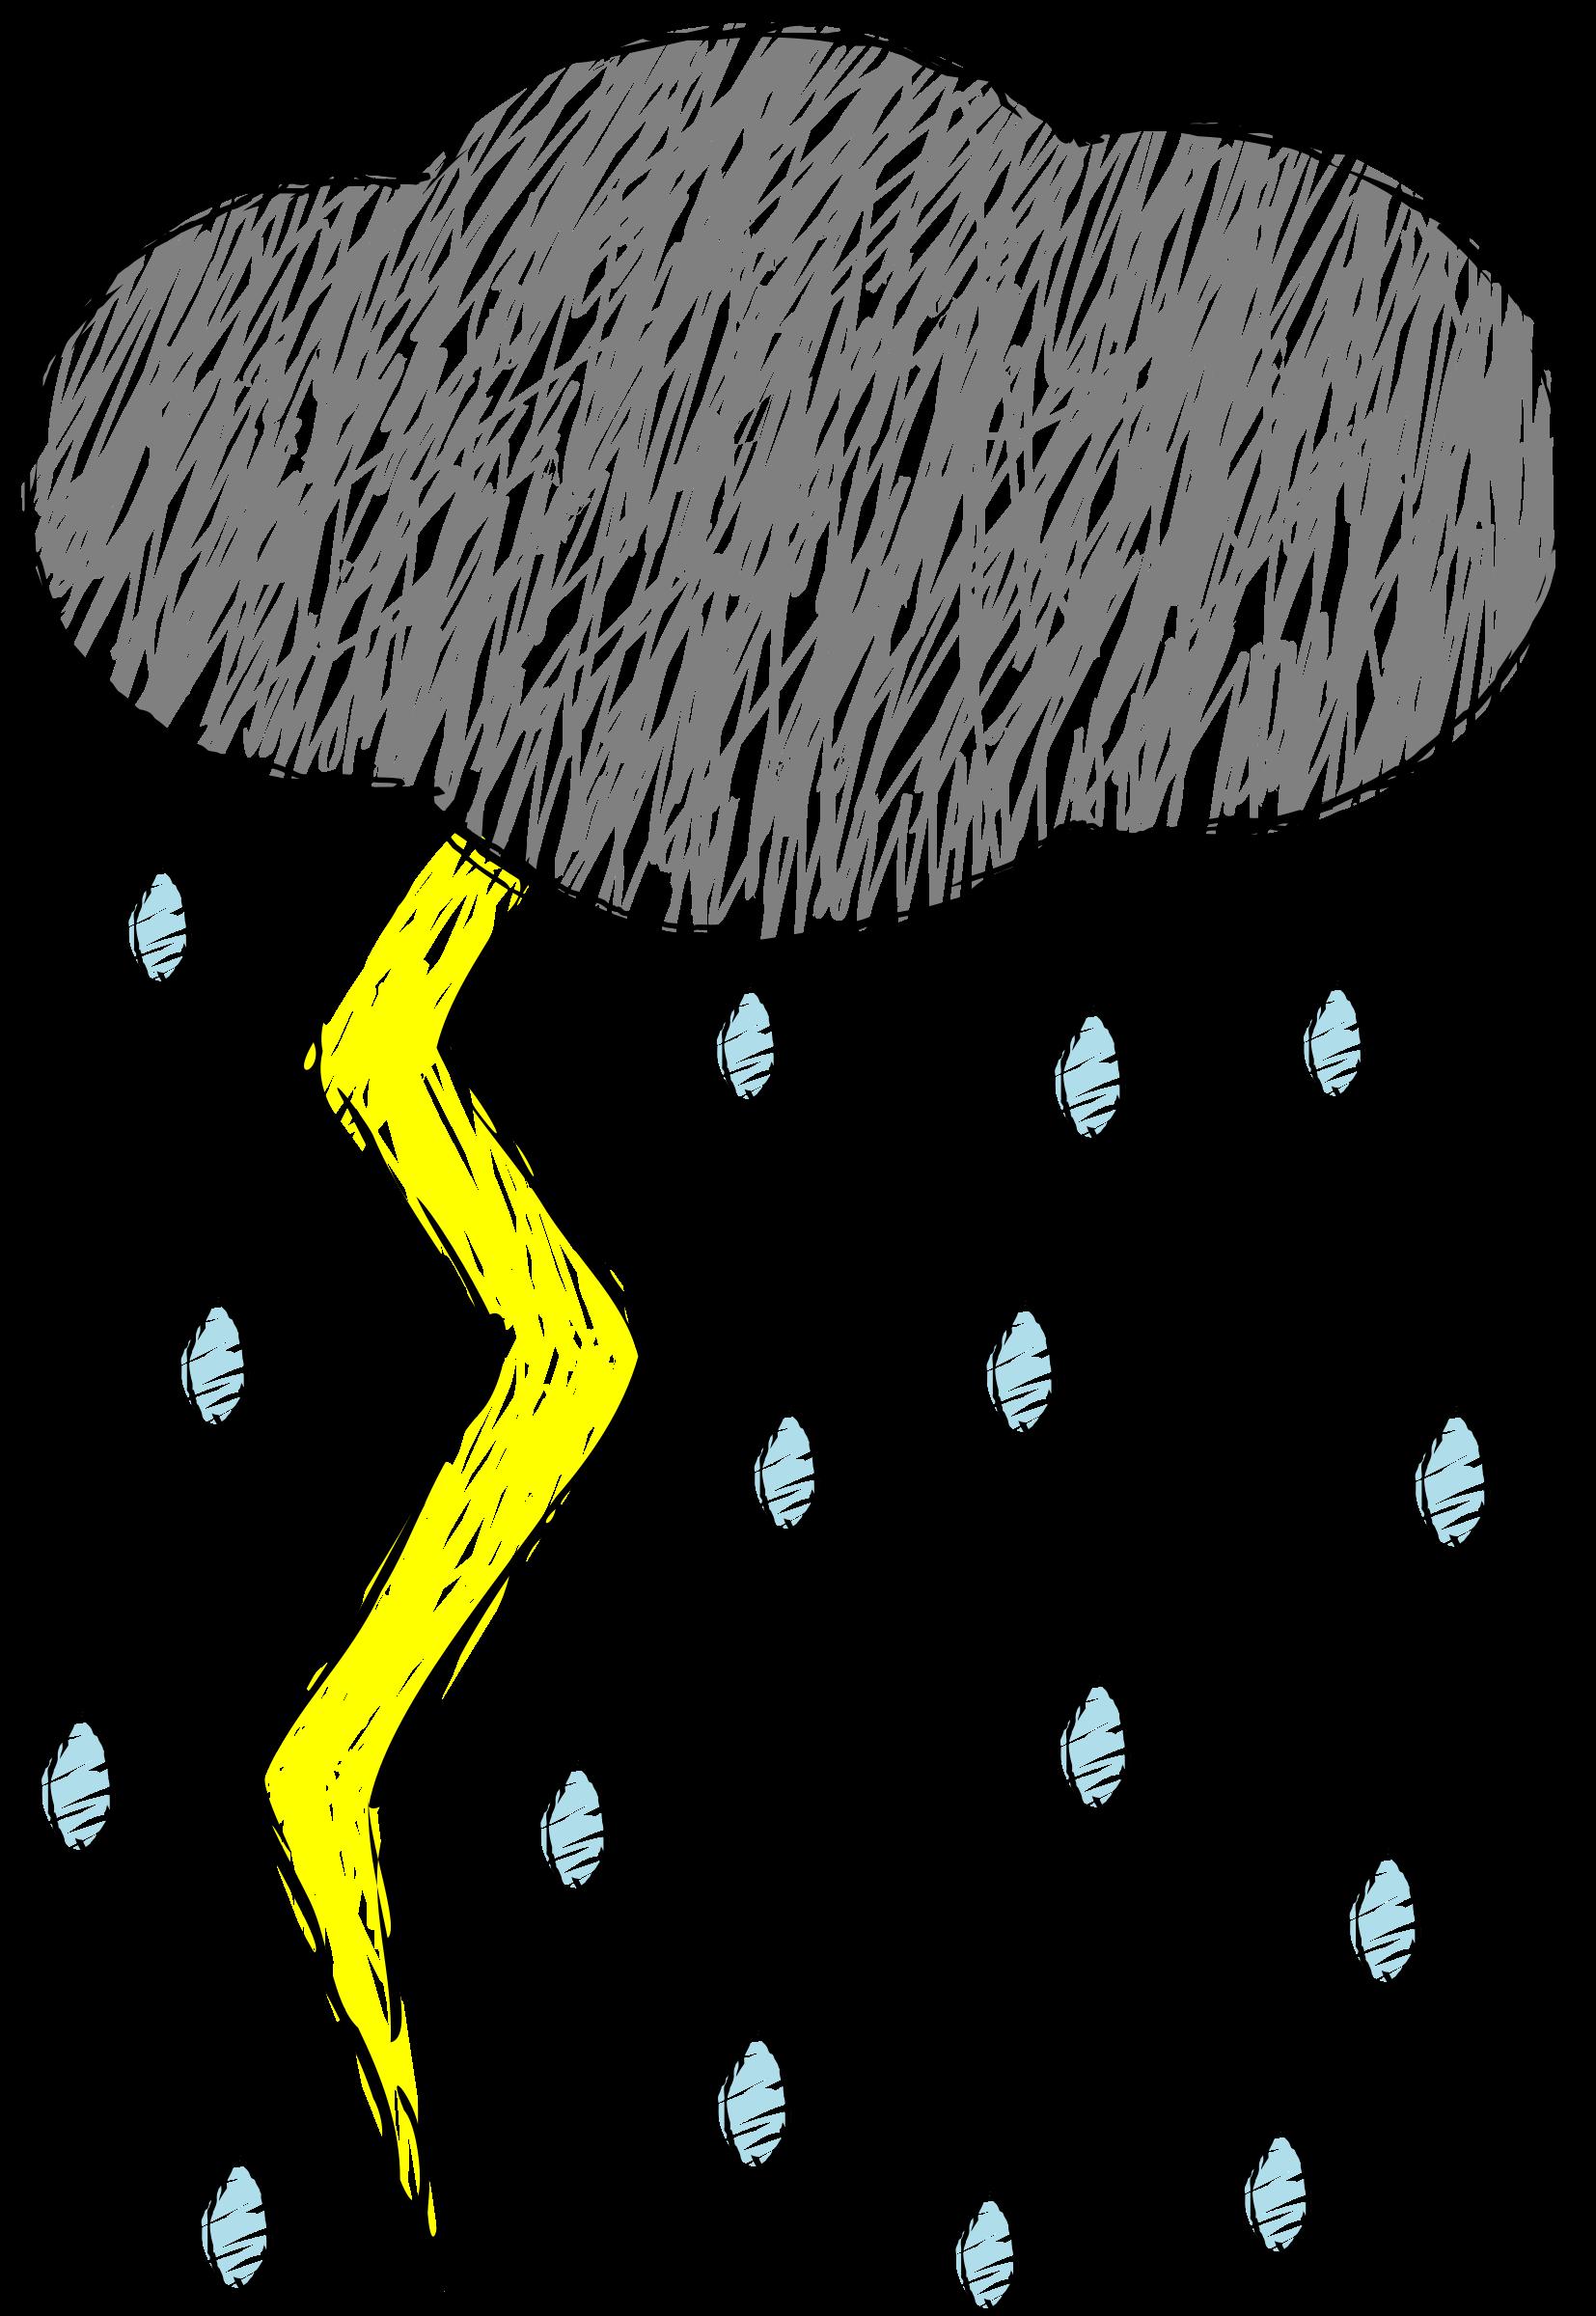 Lightning clipart sketch. Thunder and color big